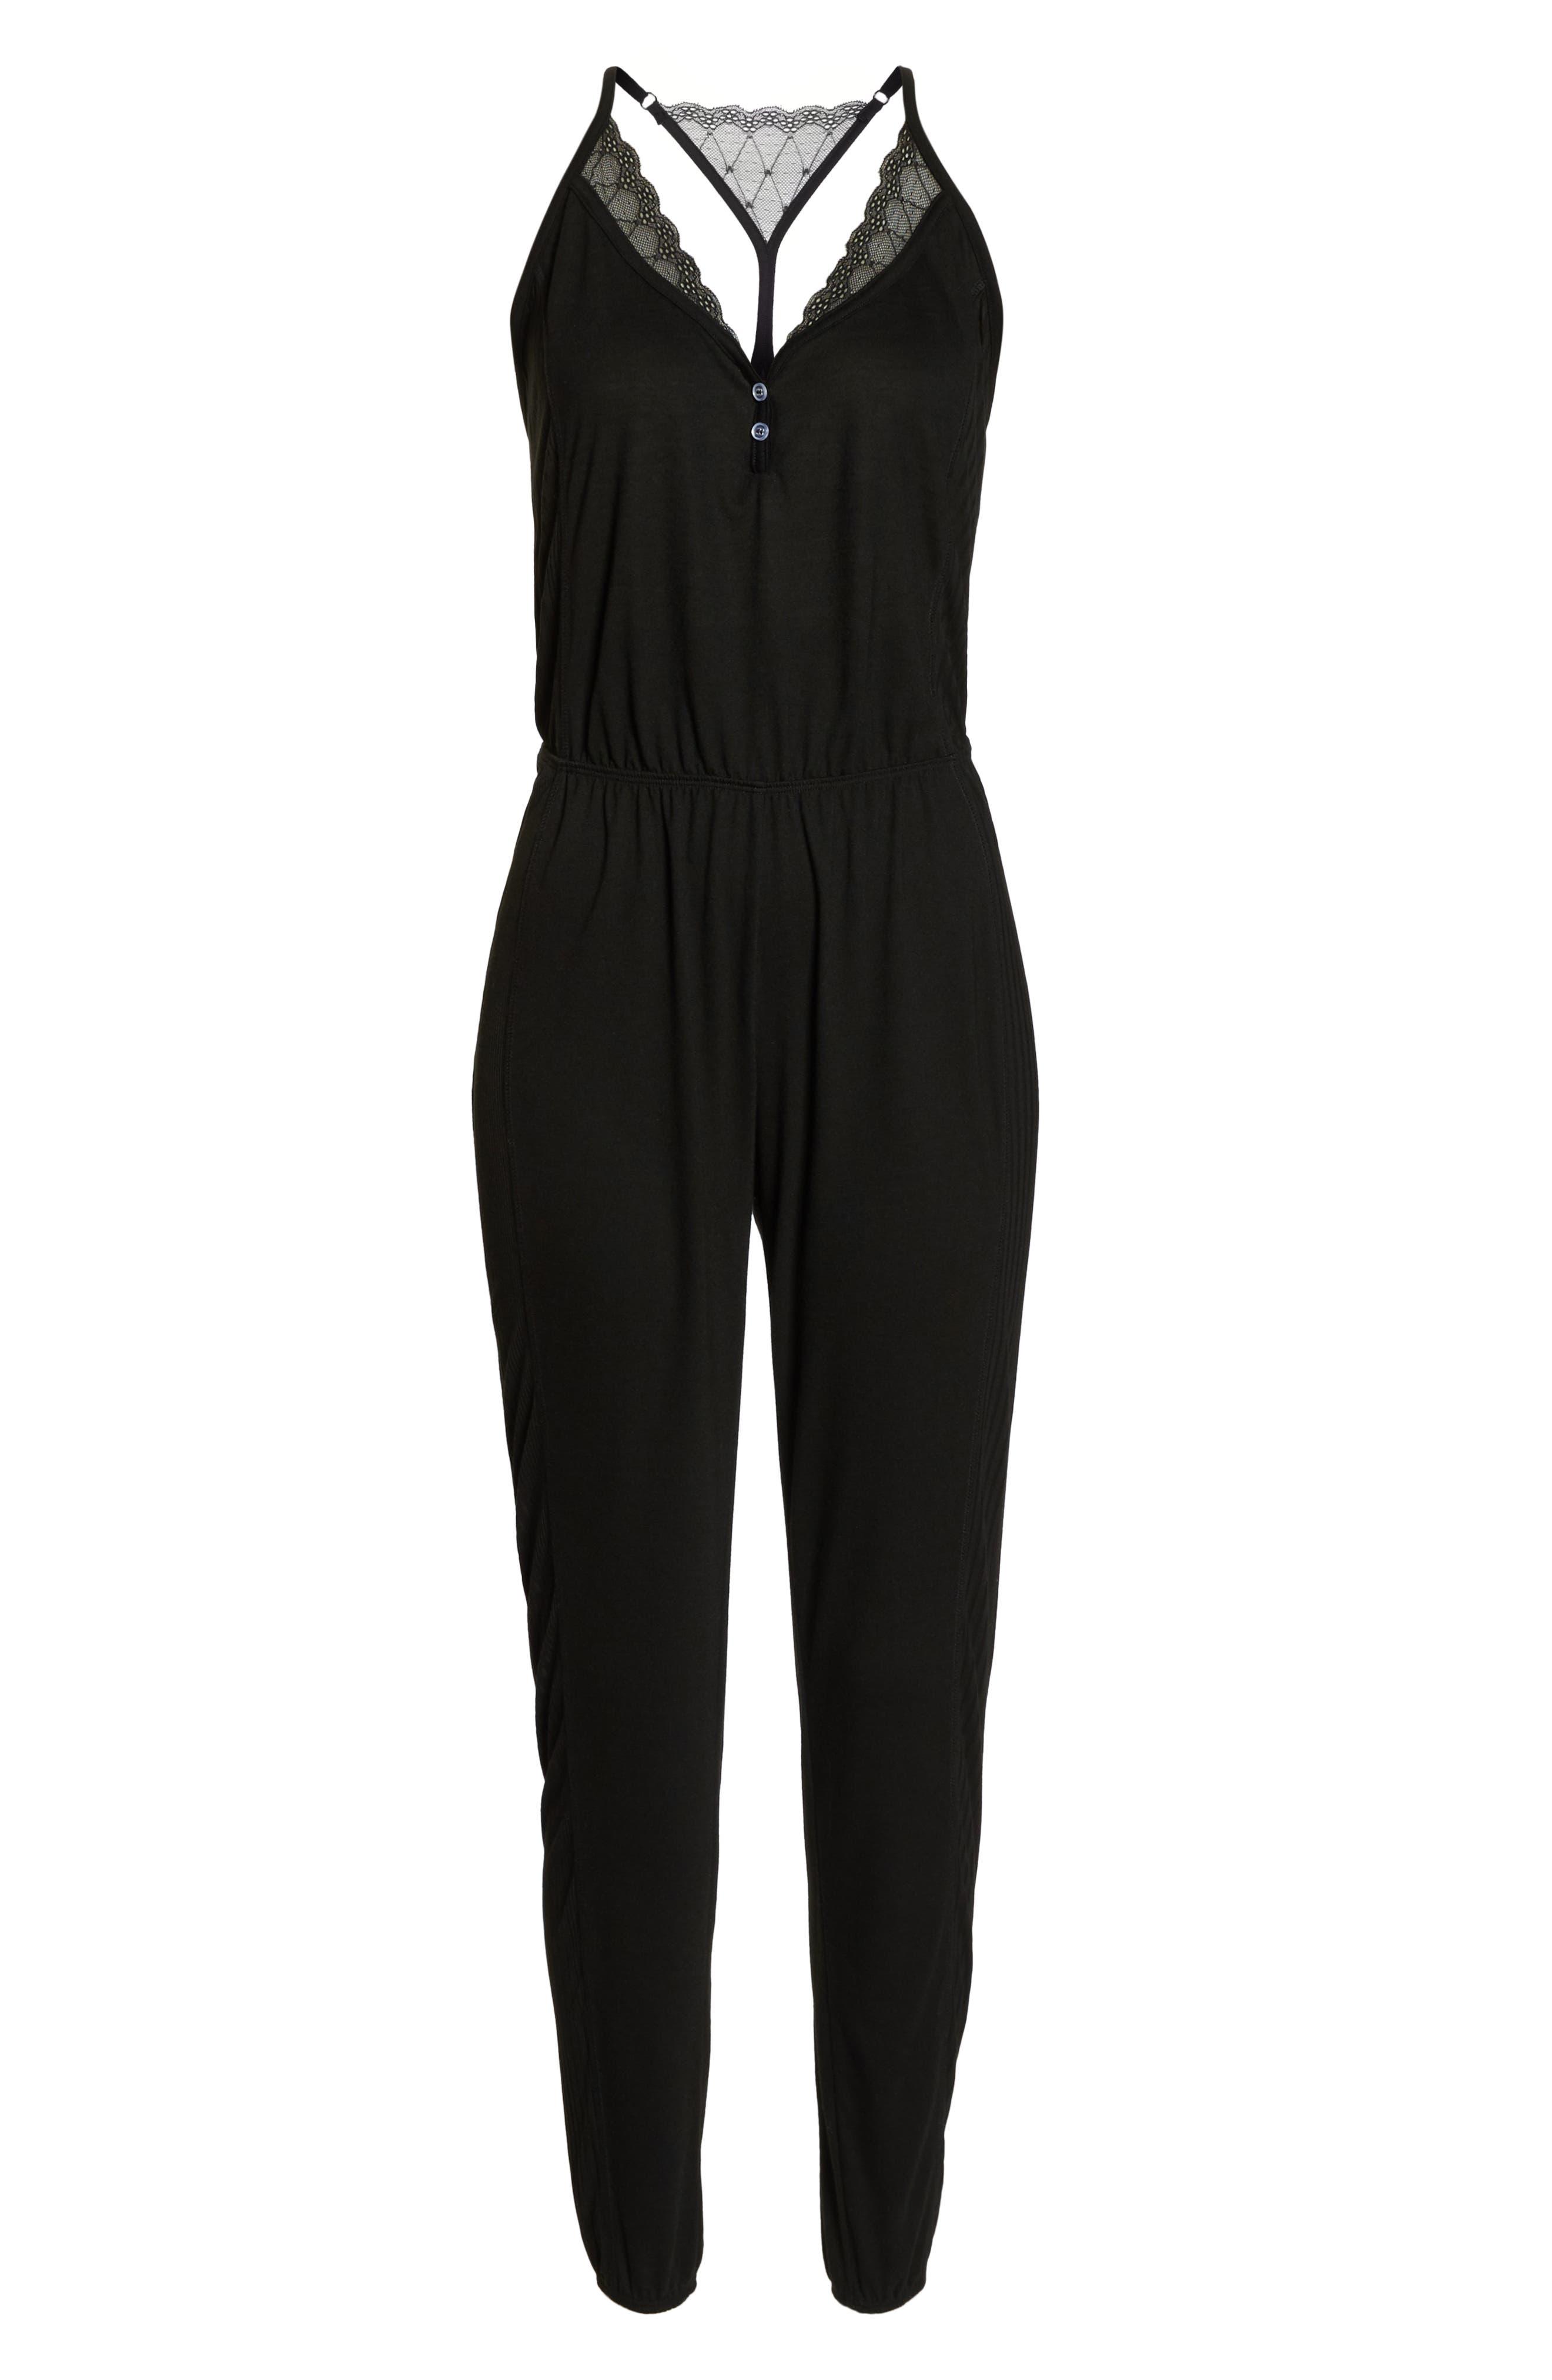 Romper Pajamas,                             Alternate thumbnail 6, color,                             BLACK